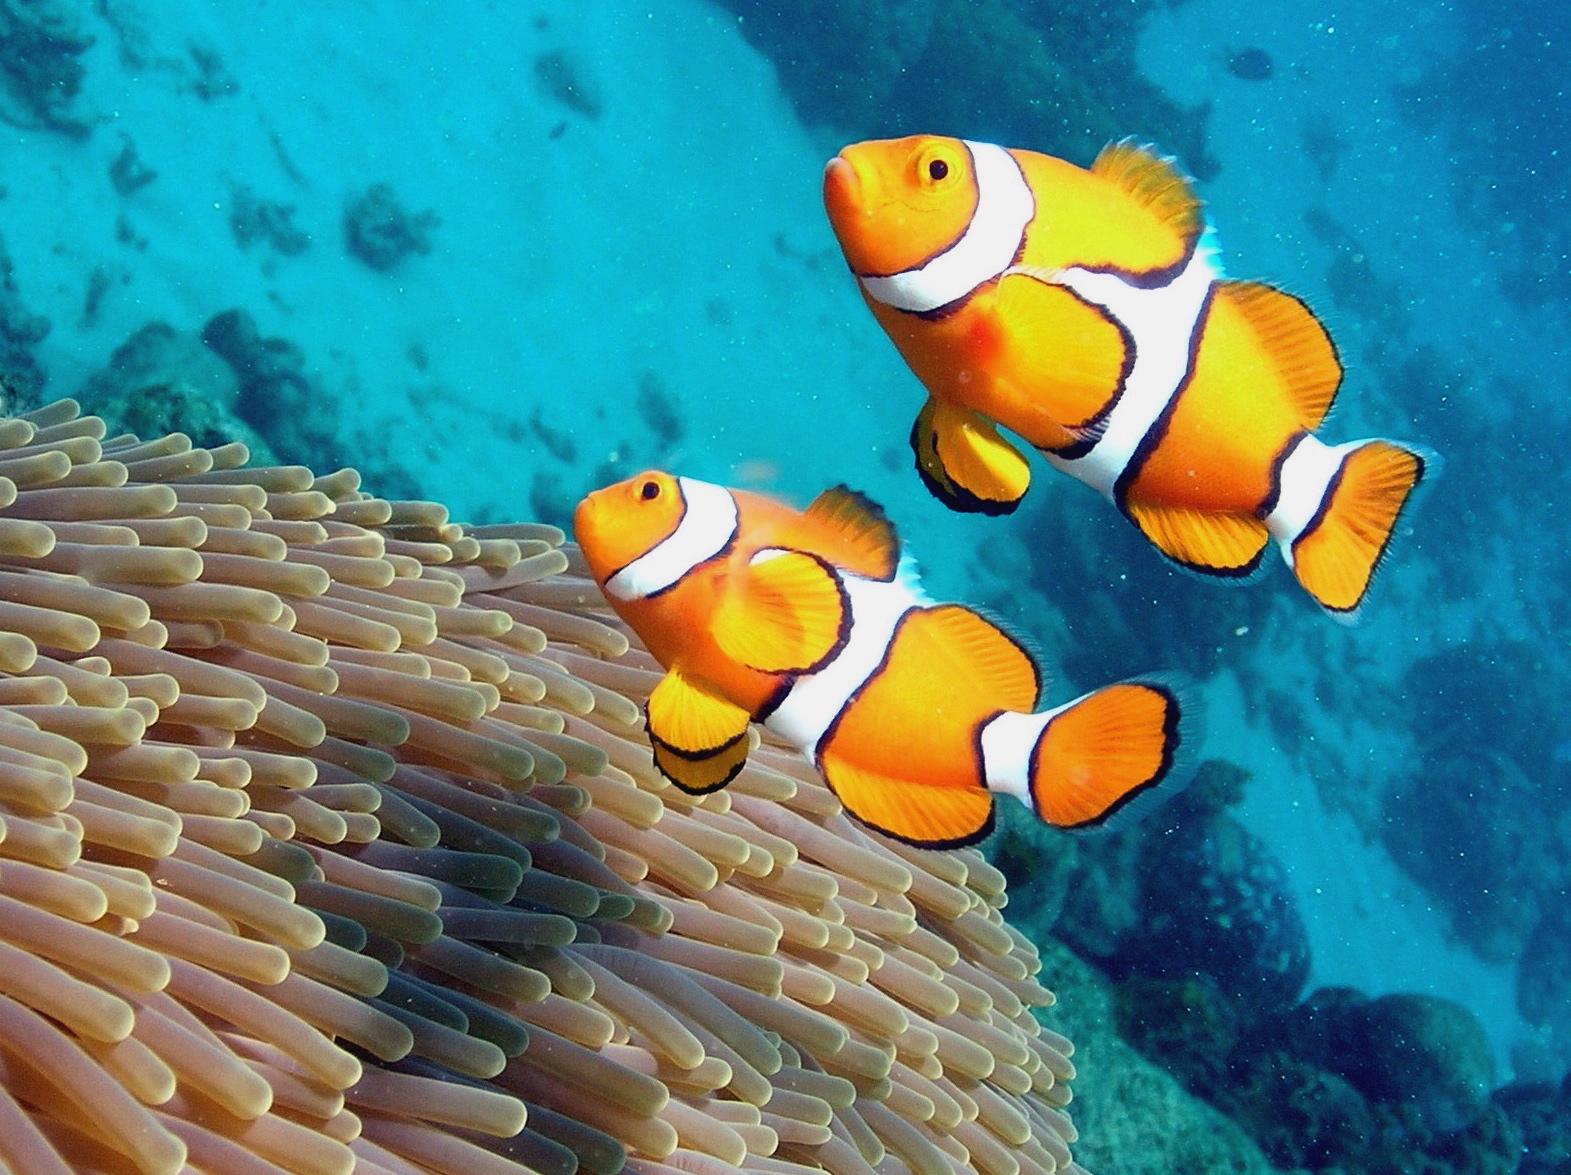 Clownfish / Ikan Badut / Ikan Nemo Wallpapers / Pictures